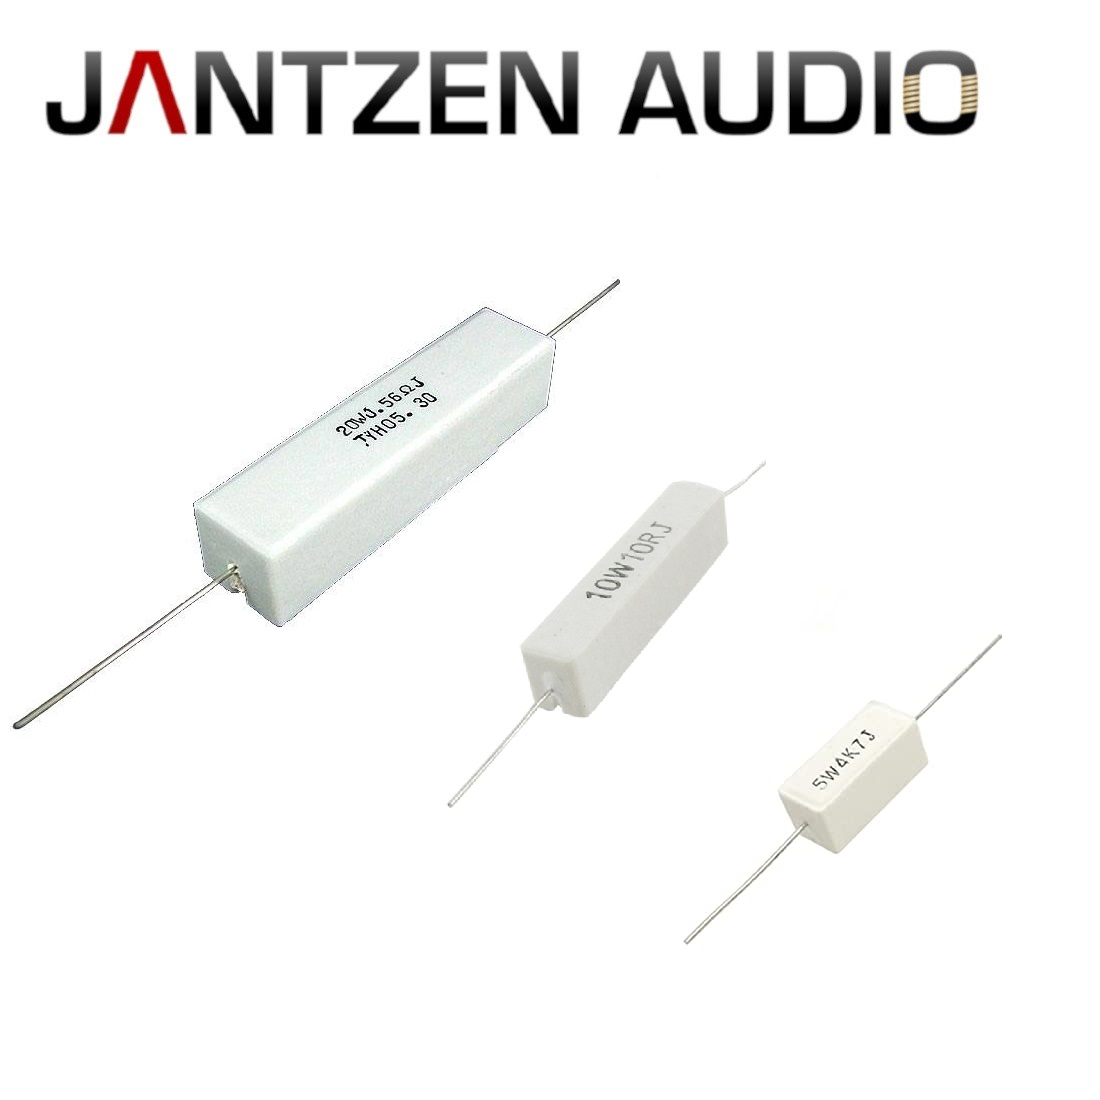 Jantzen-Audio Keramik Widerstand 20 Watt